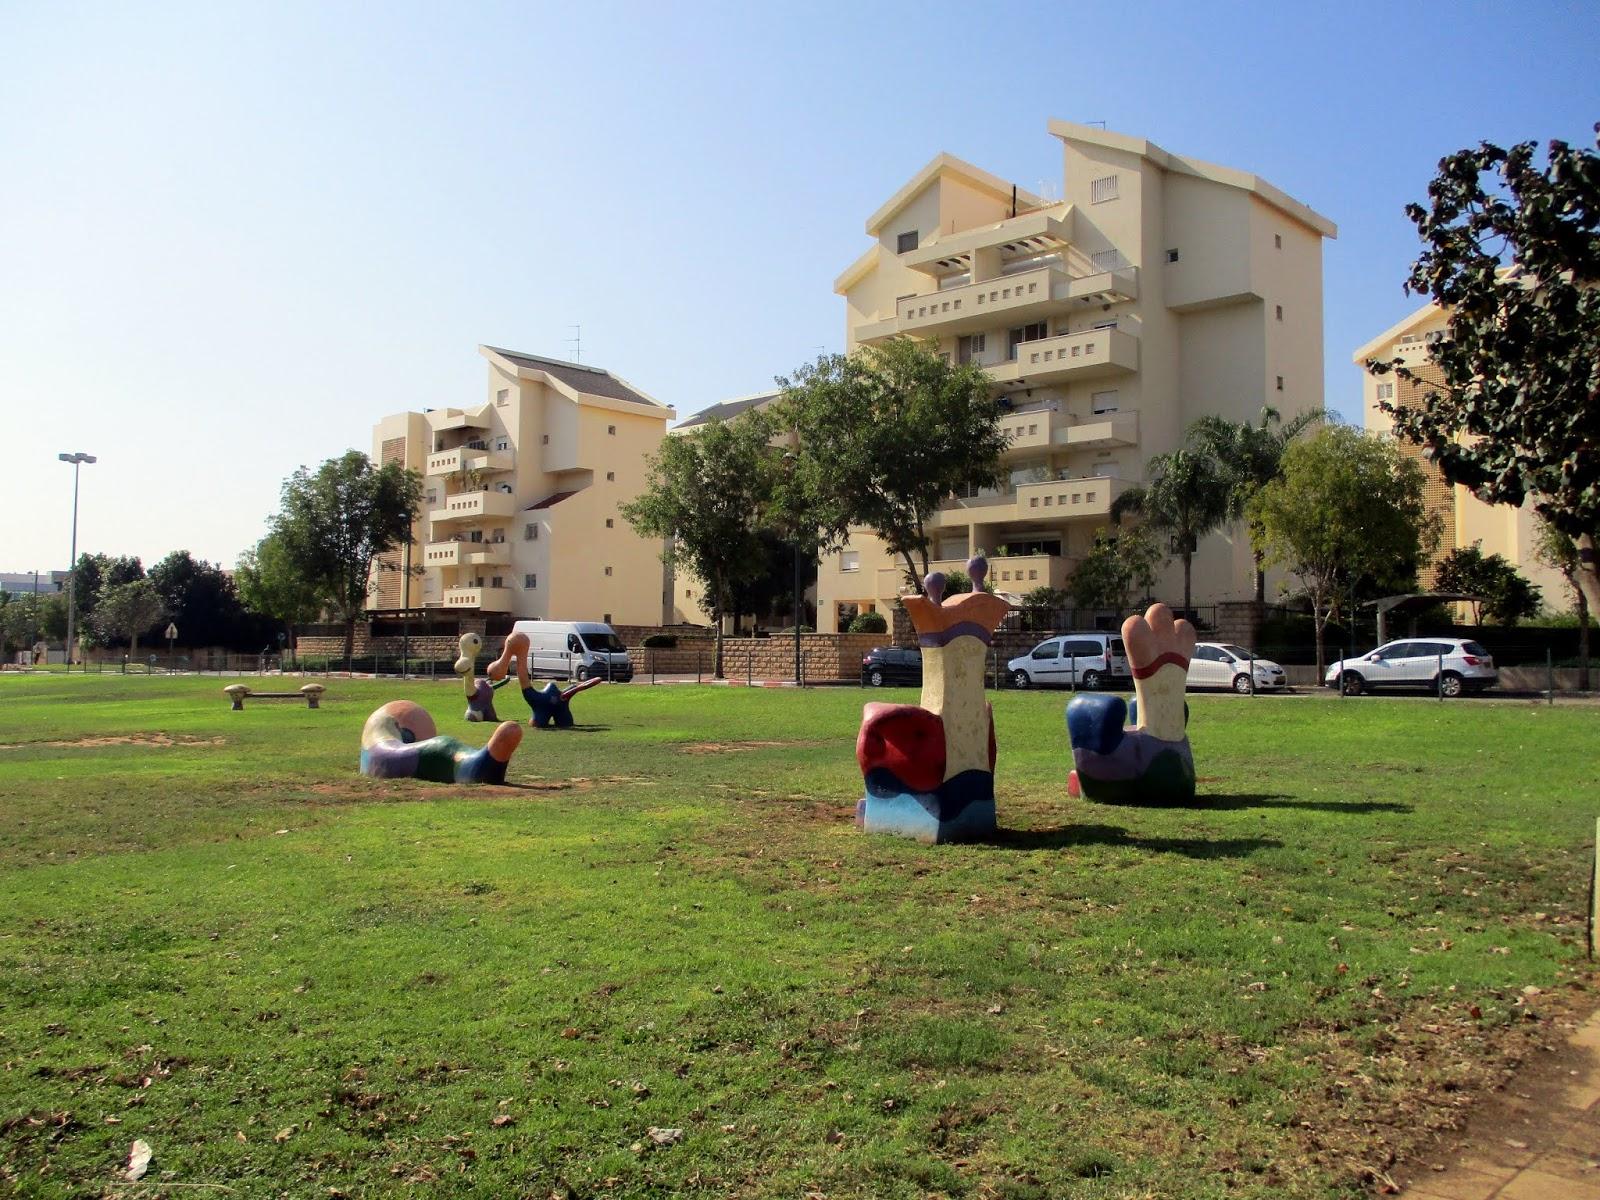 кфар-саба израиль квартира купить